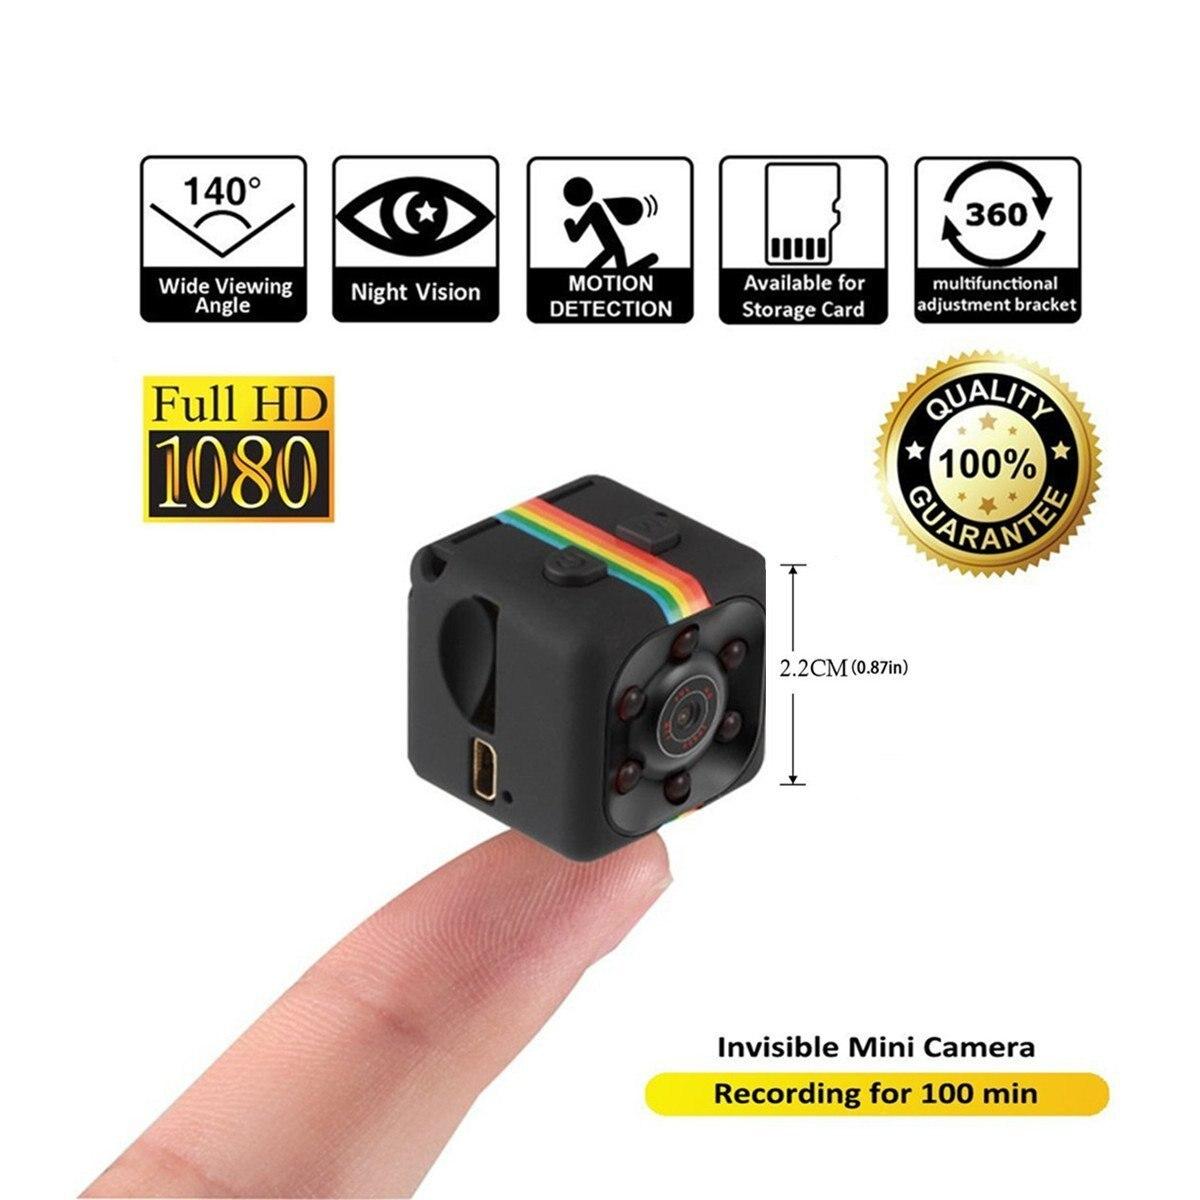 SQ11 Mini Macchina Fotografica 1080 P Sport DV Mini Visione Notturna A Raggi Infrarossi Monitor Nascosta piccola Telecamera SQ 11 piccola telecamera DV Video registratore